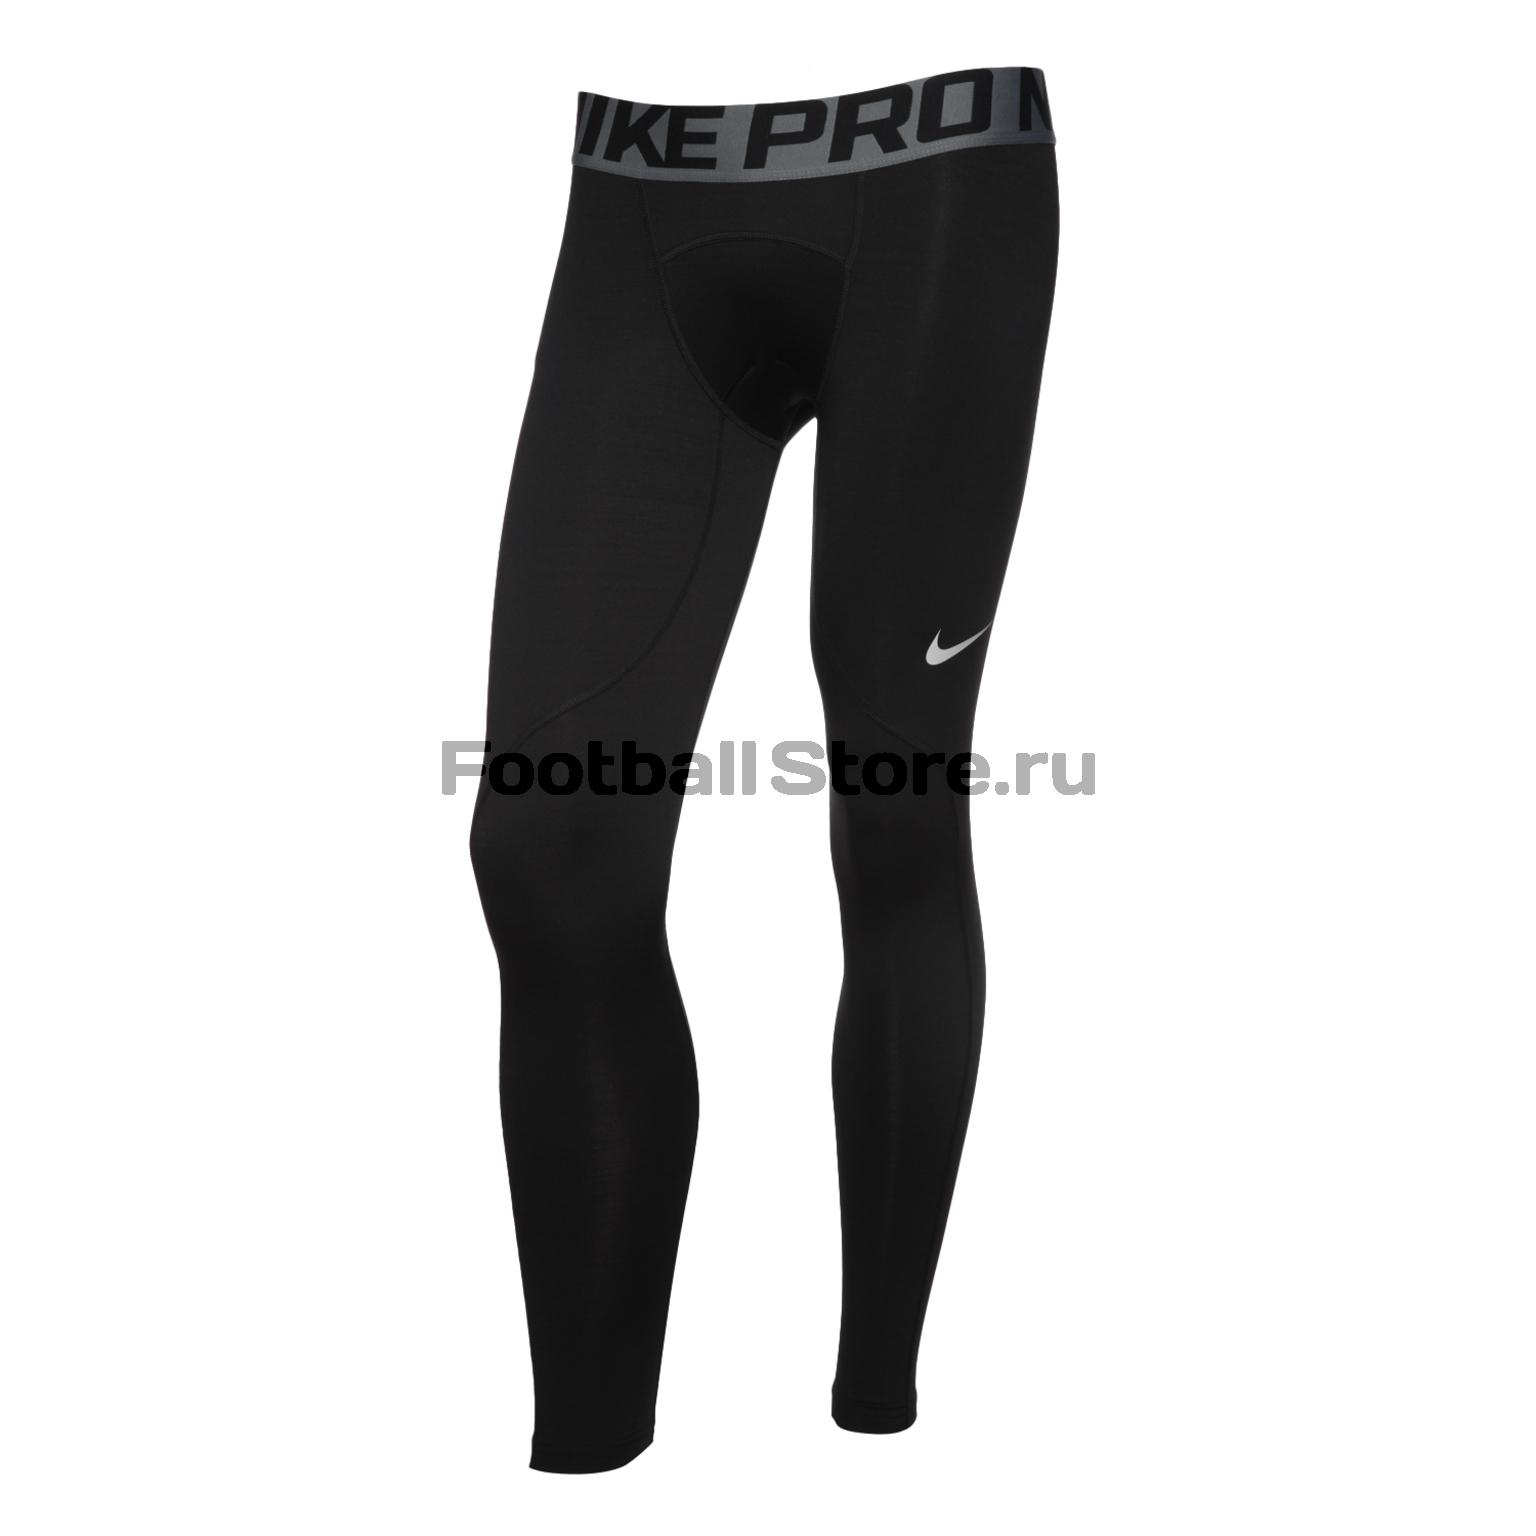 Белье лосины Nike Warm Tights 838038-010